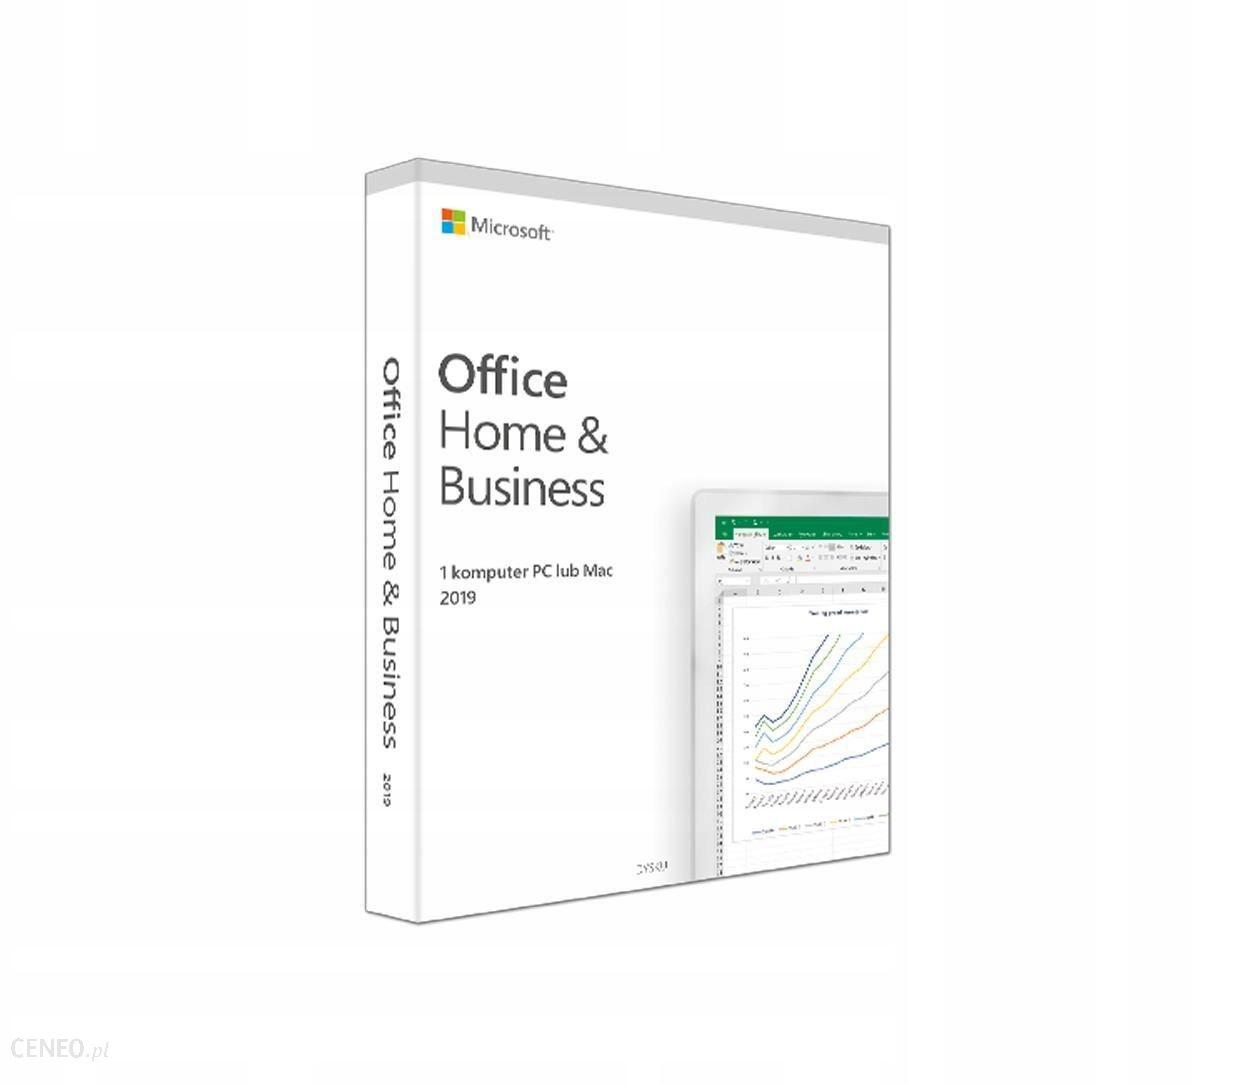 Microsoft Office Home Busines MAC 2019 32/64bit PL